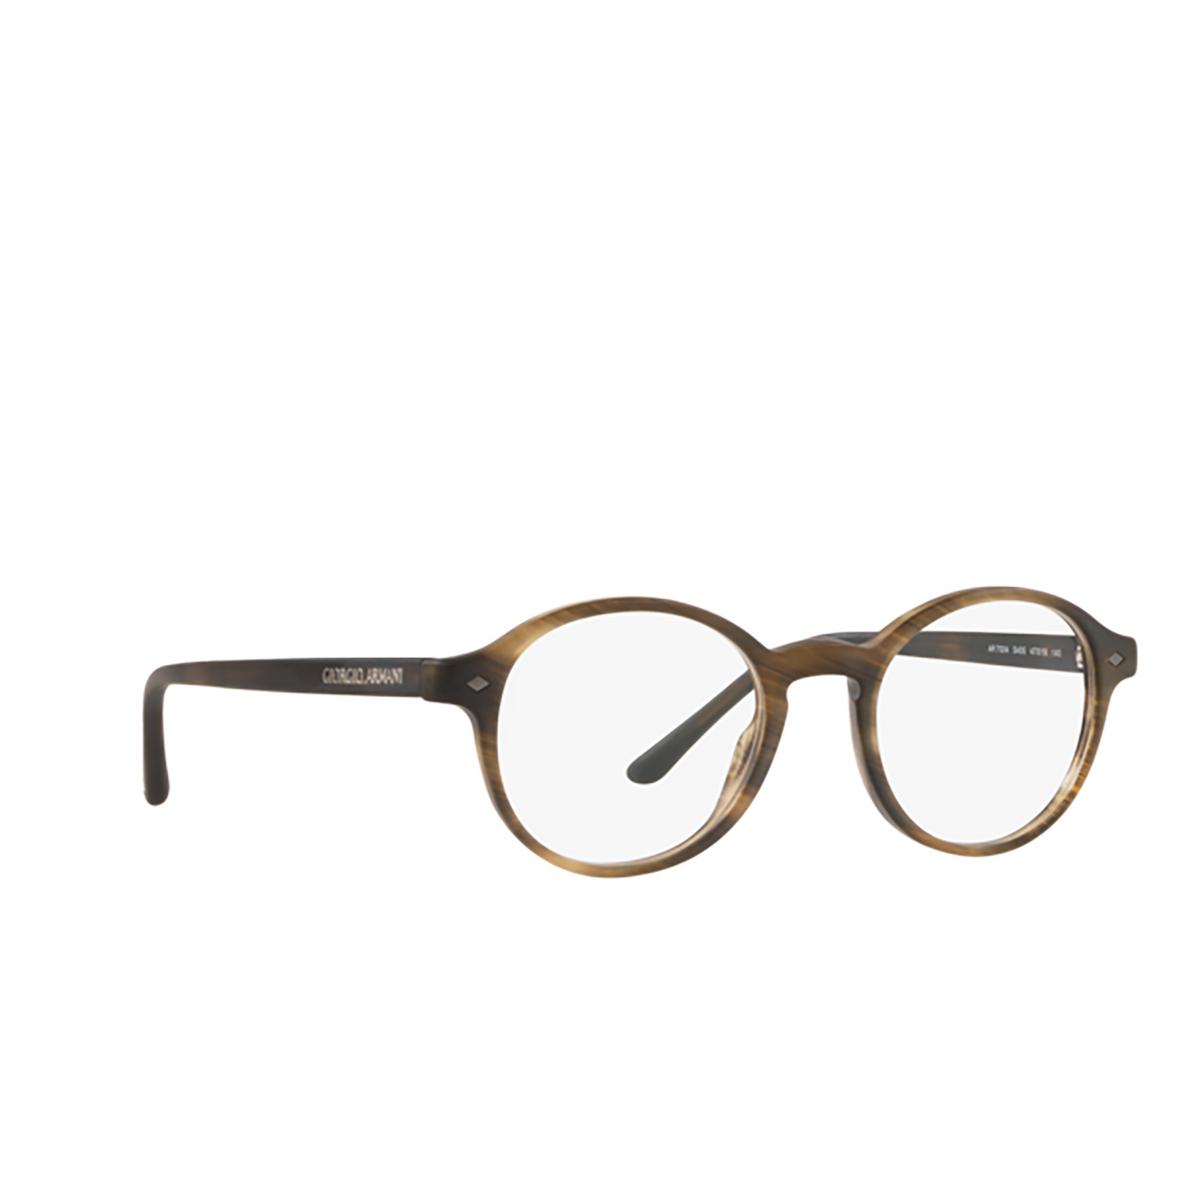 Giorgio Armani® Round Eyeglasses: AR7004 color Matte Striped Brown 5405 - three-quarters view.